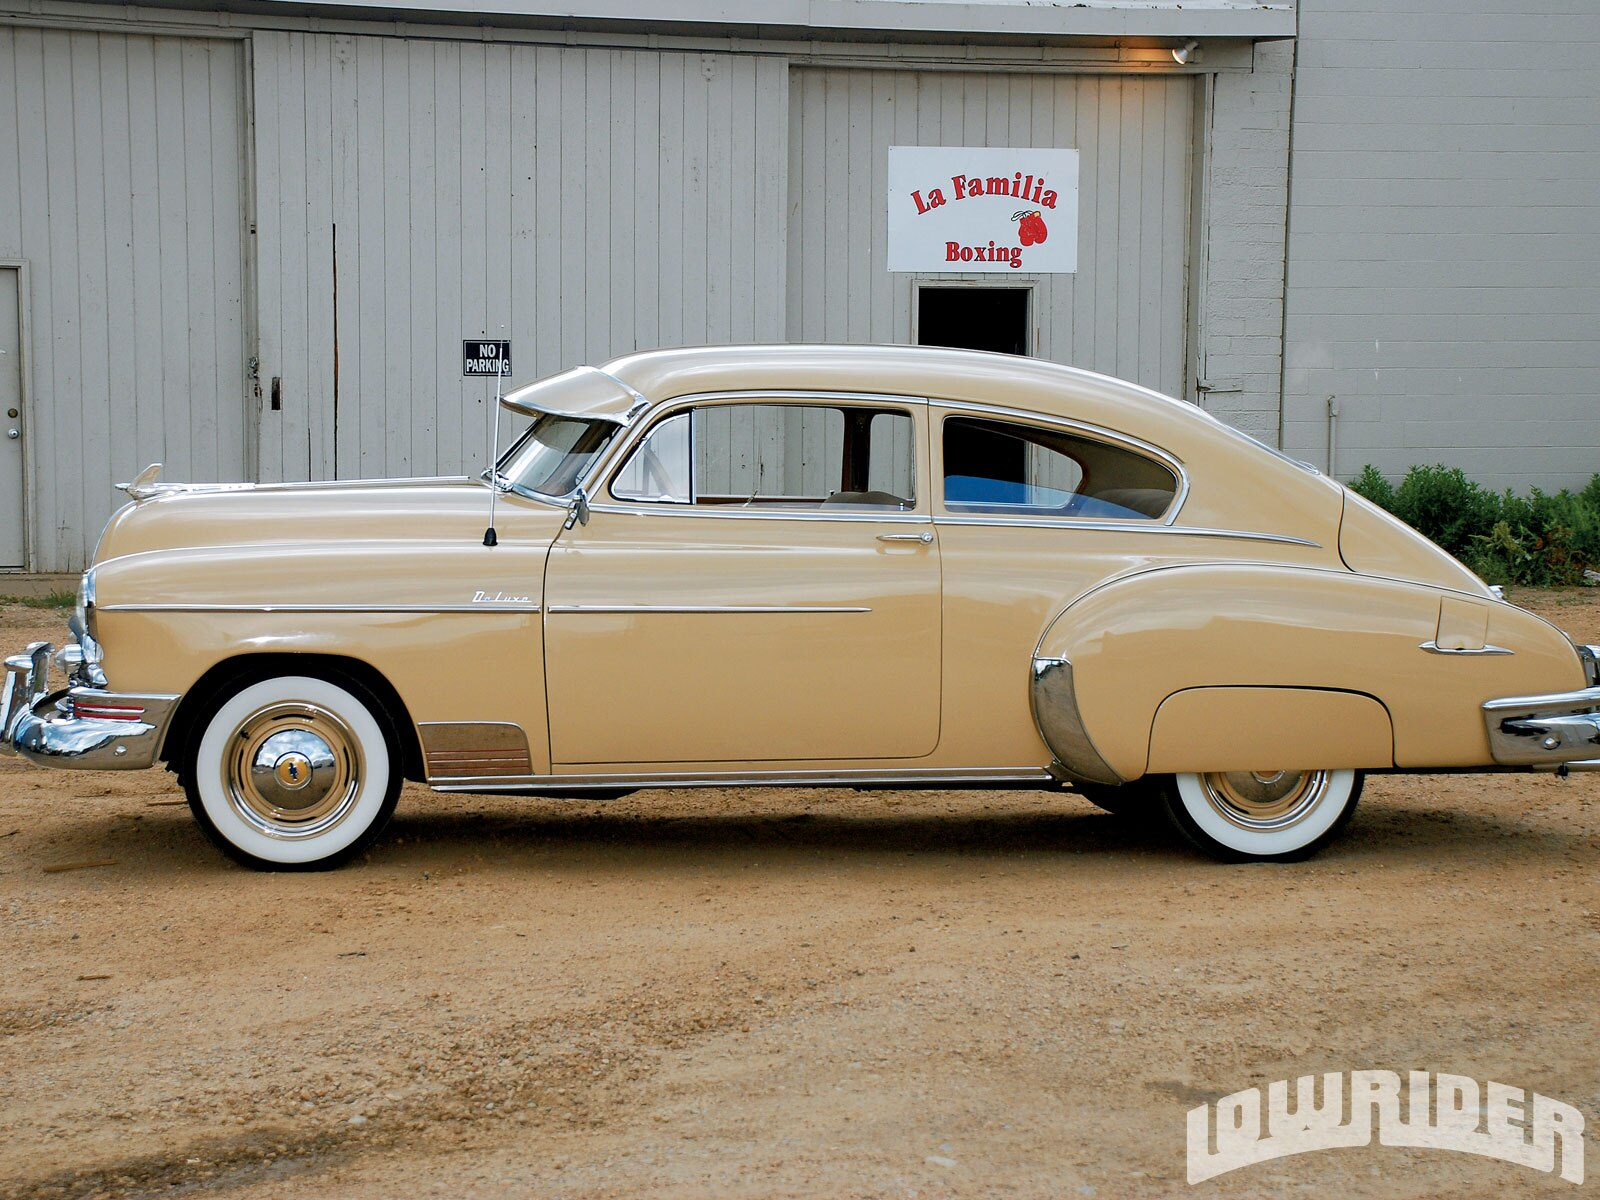 1950 Chevrolet Fleetline Deluxe Lowrirder Magazine